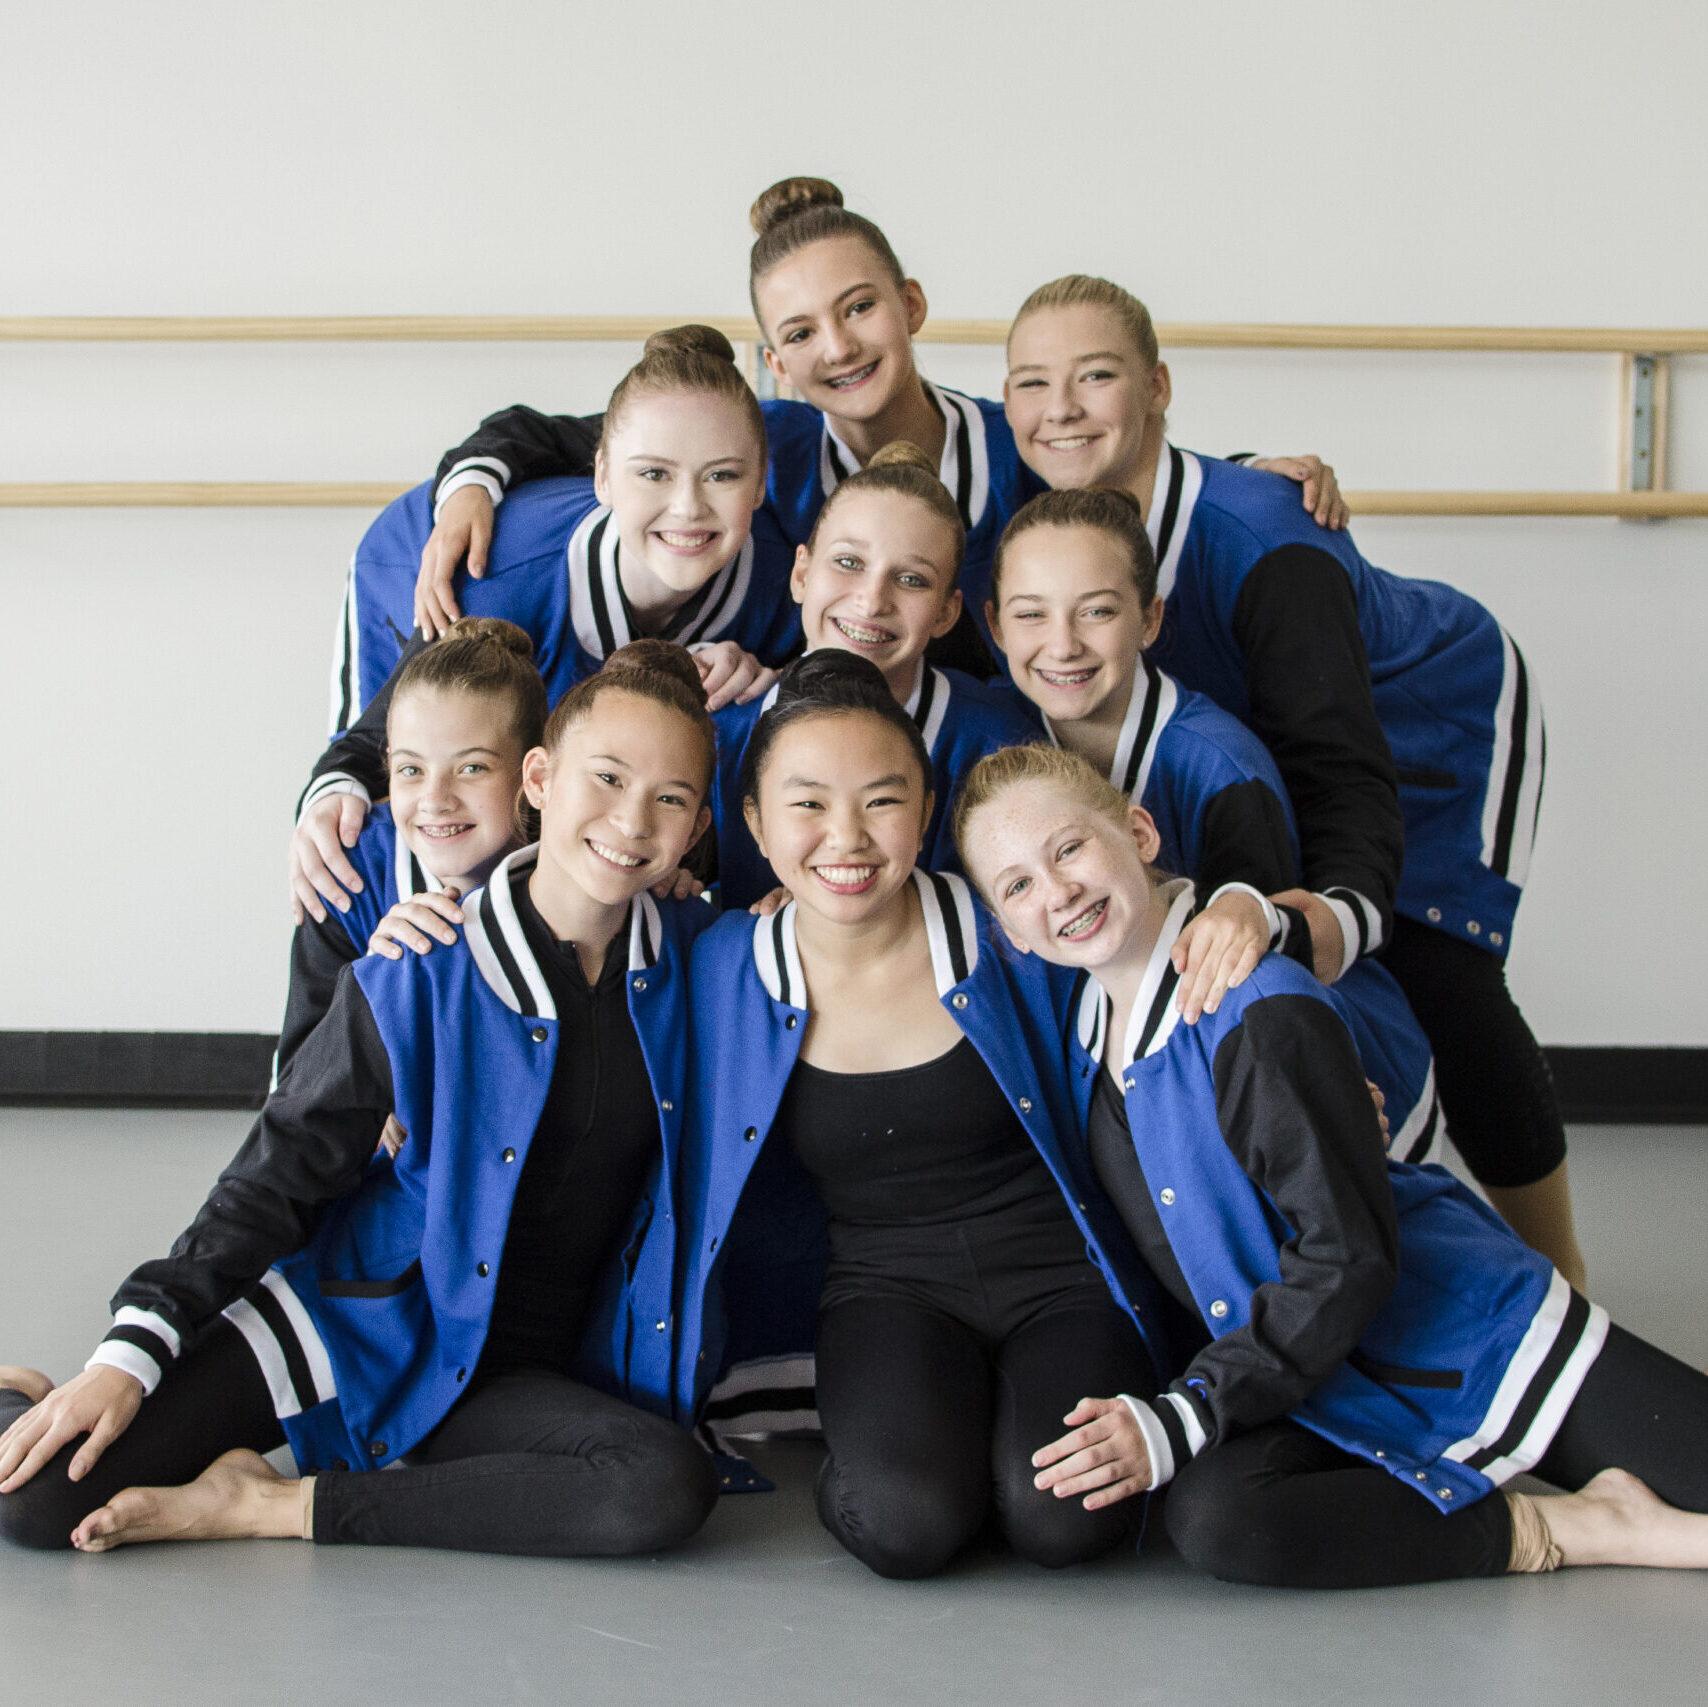 Versafied Dance Co. 2017-18